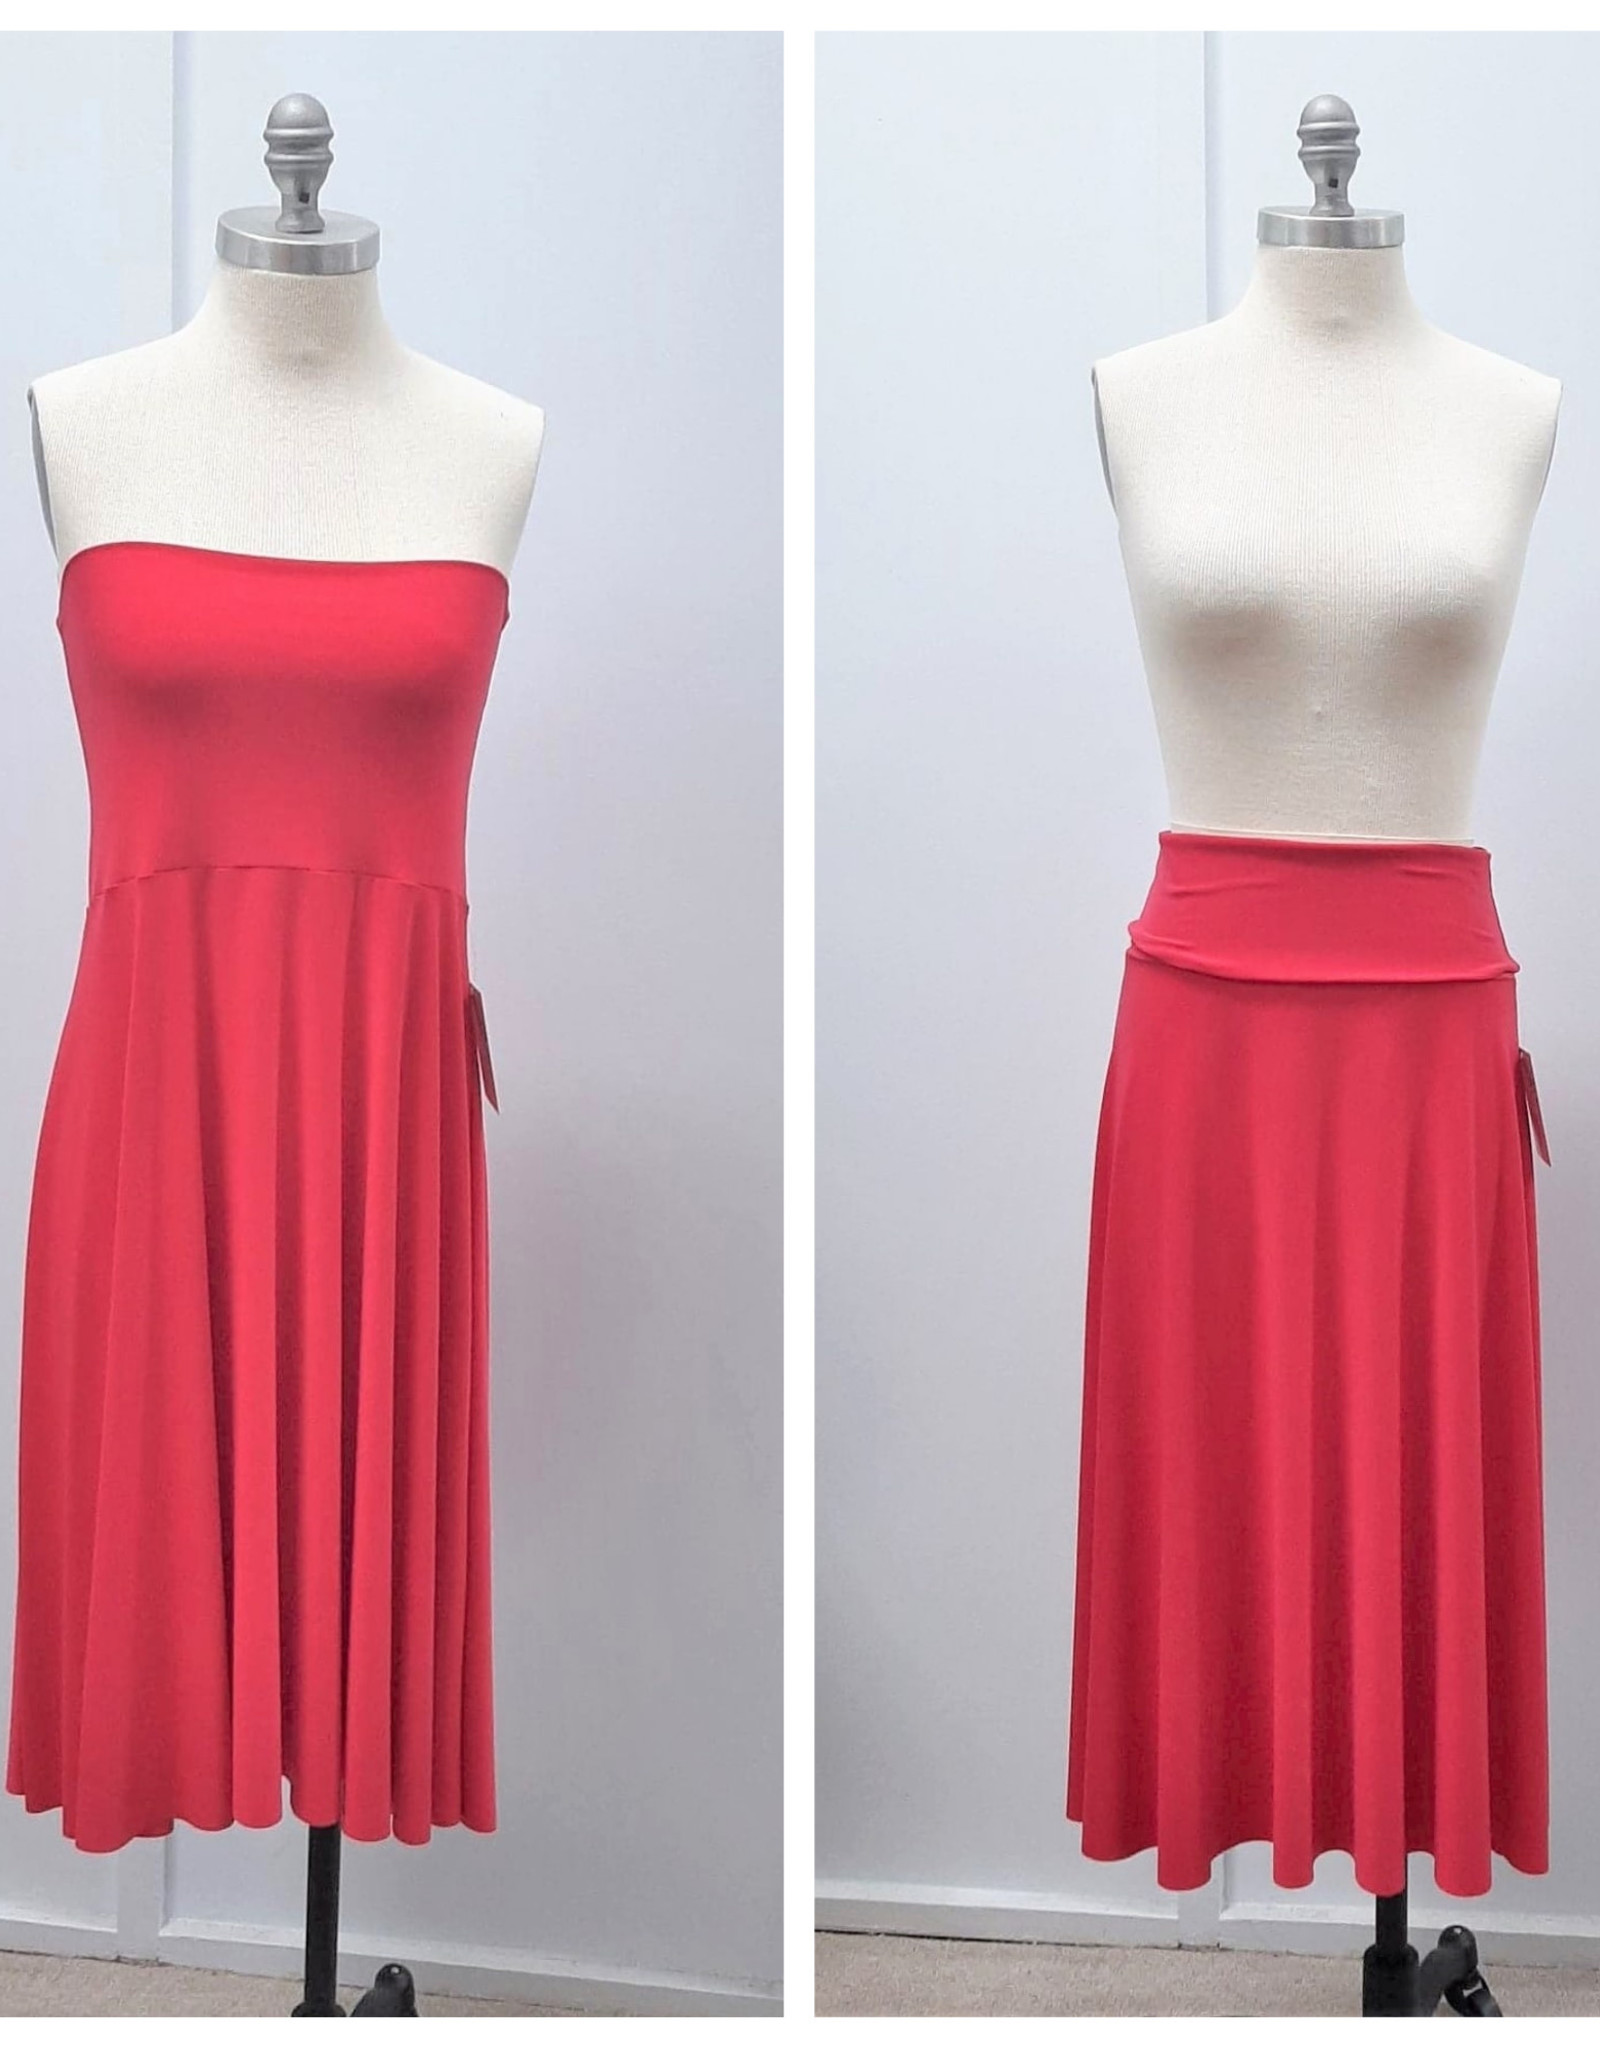 Sympli Maxi Skirt/ Tube Dress - Size 10 (Consignment)